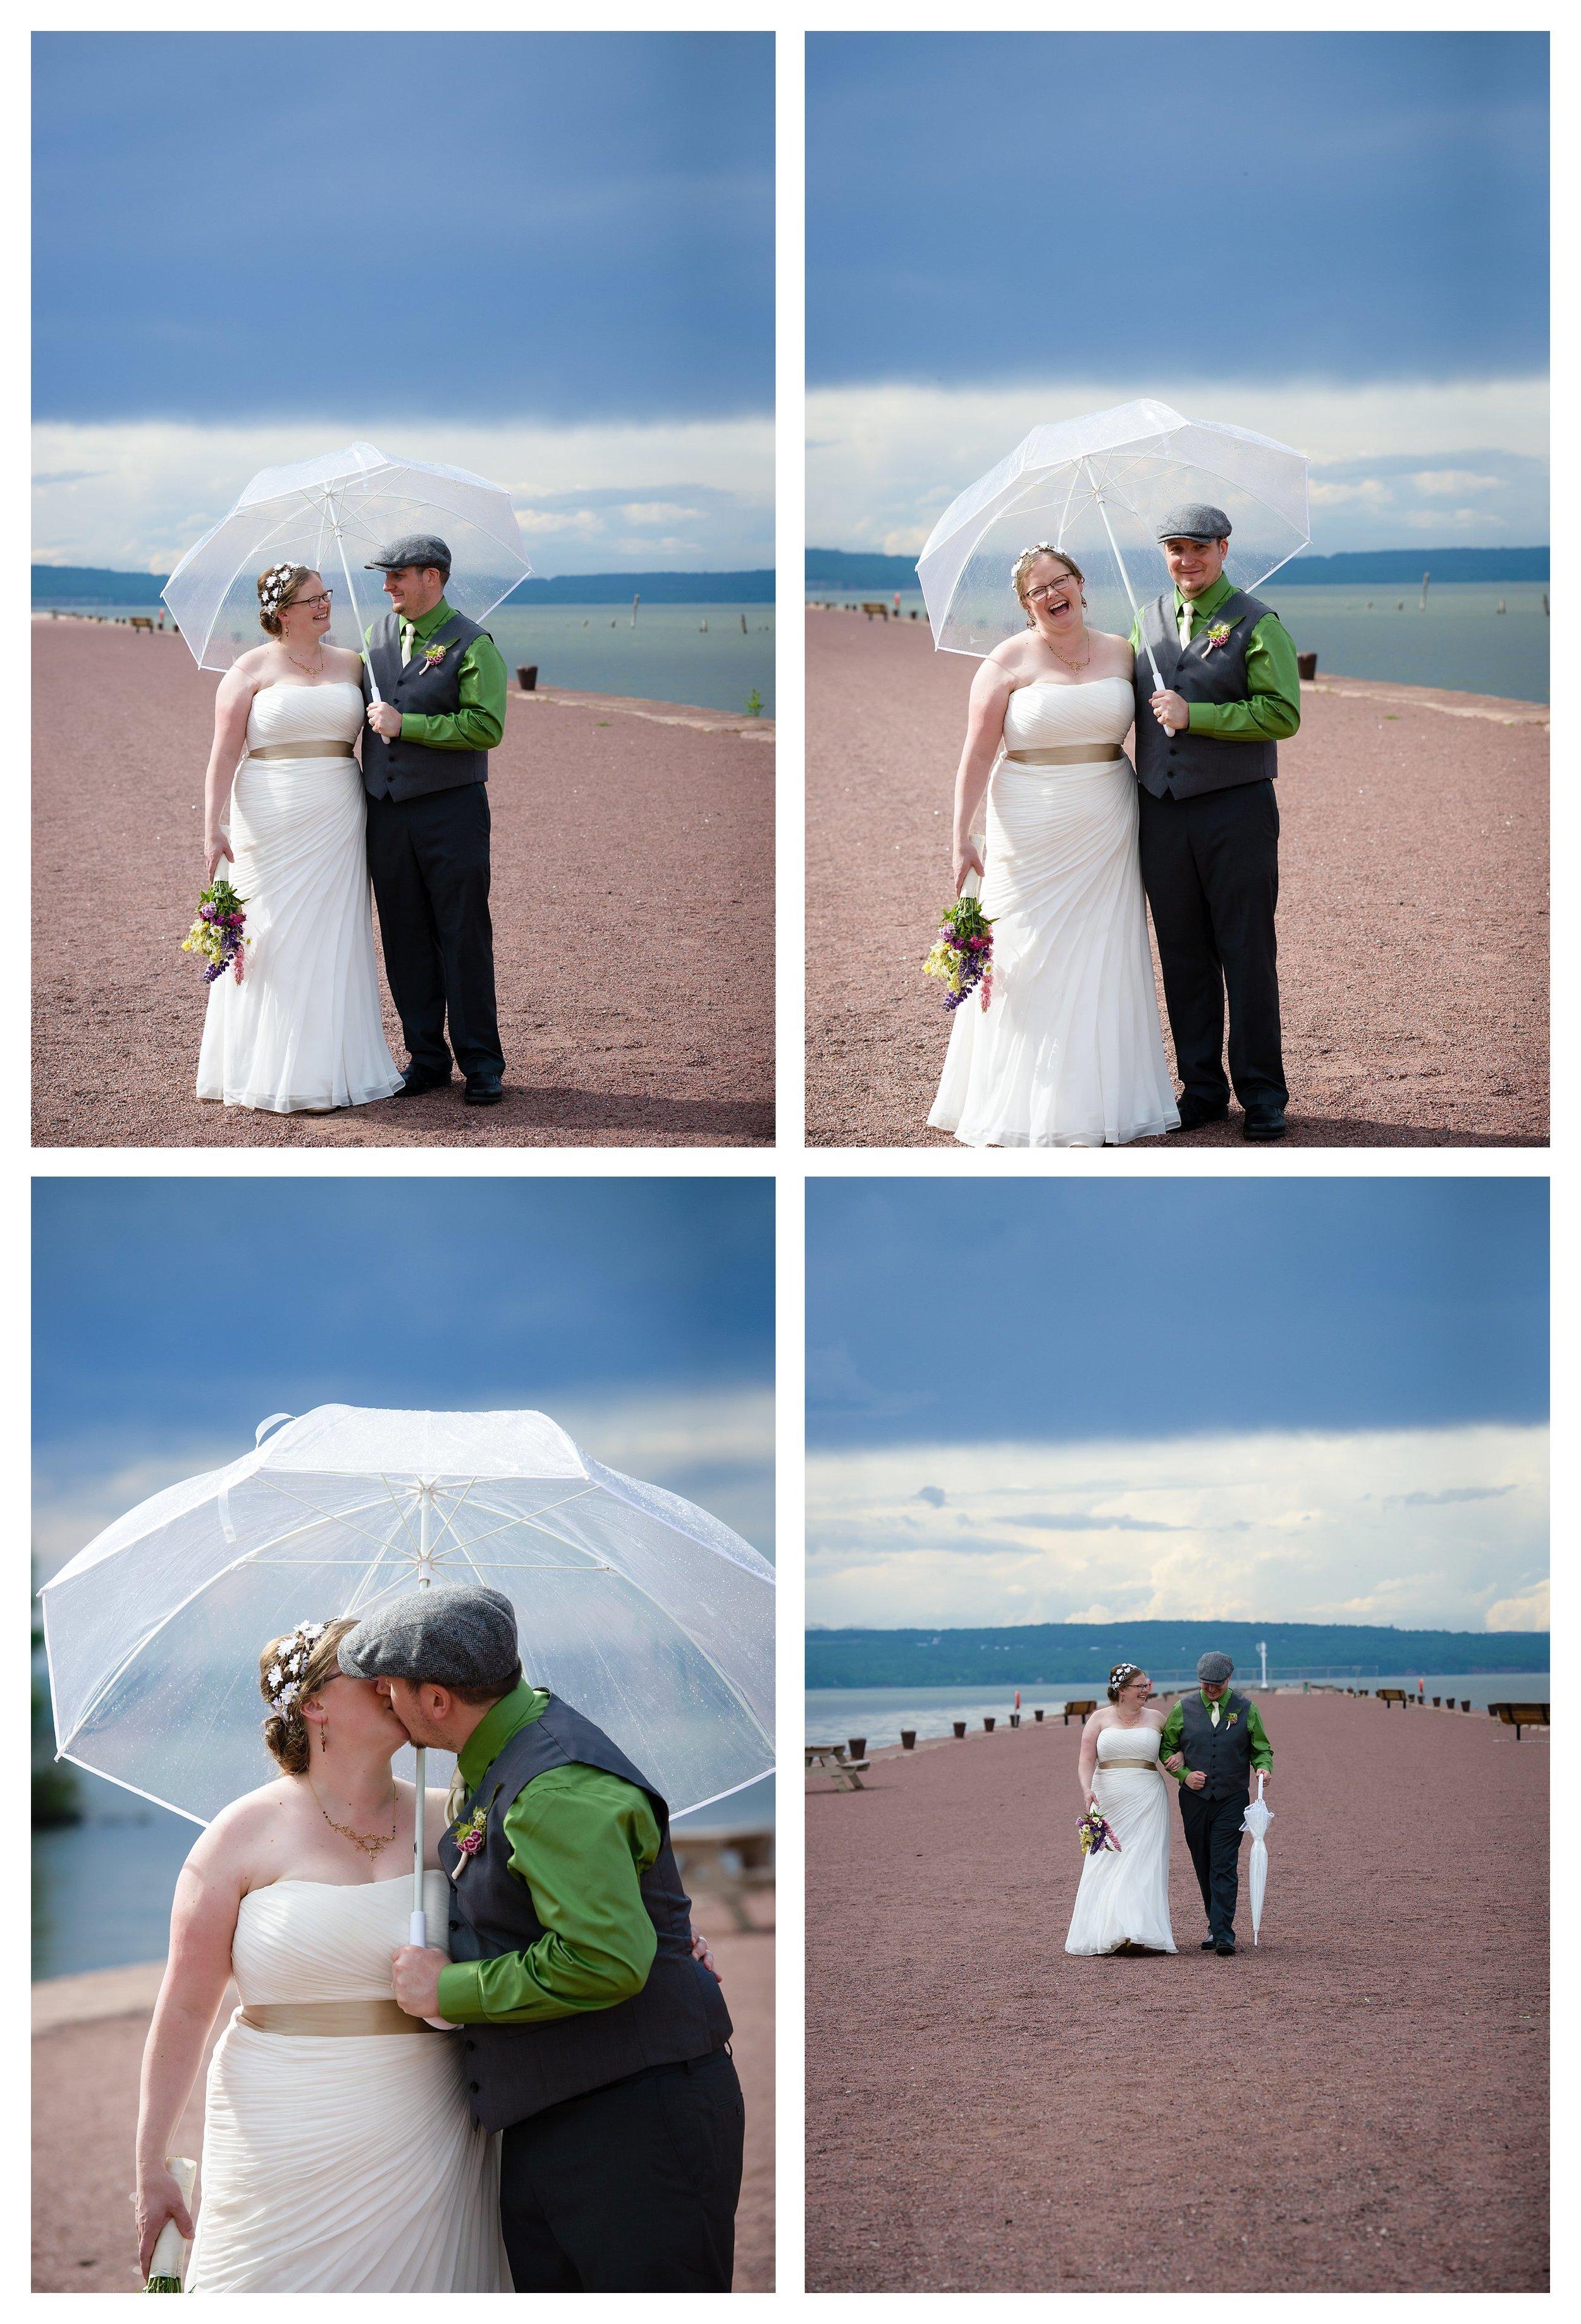 ashland oredock northwoods wisconsin wedding ps 139 photography_0294.jpg